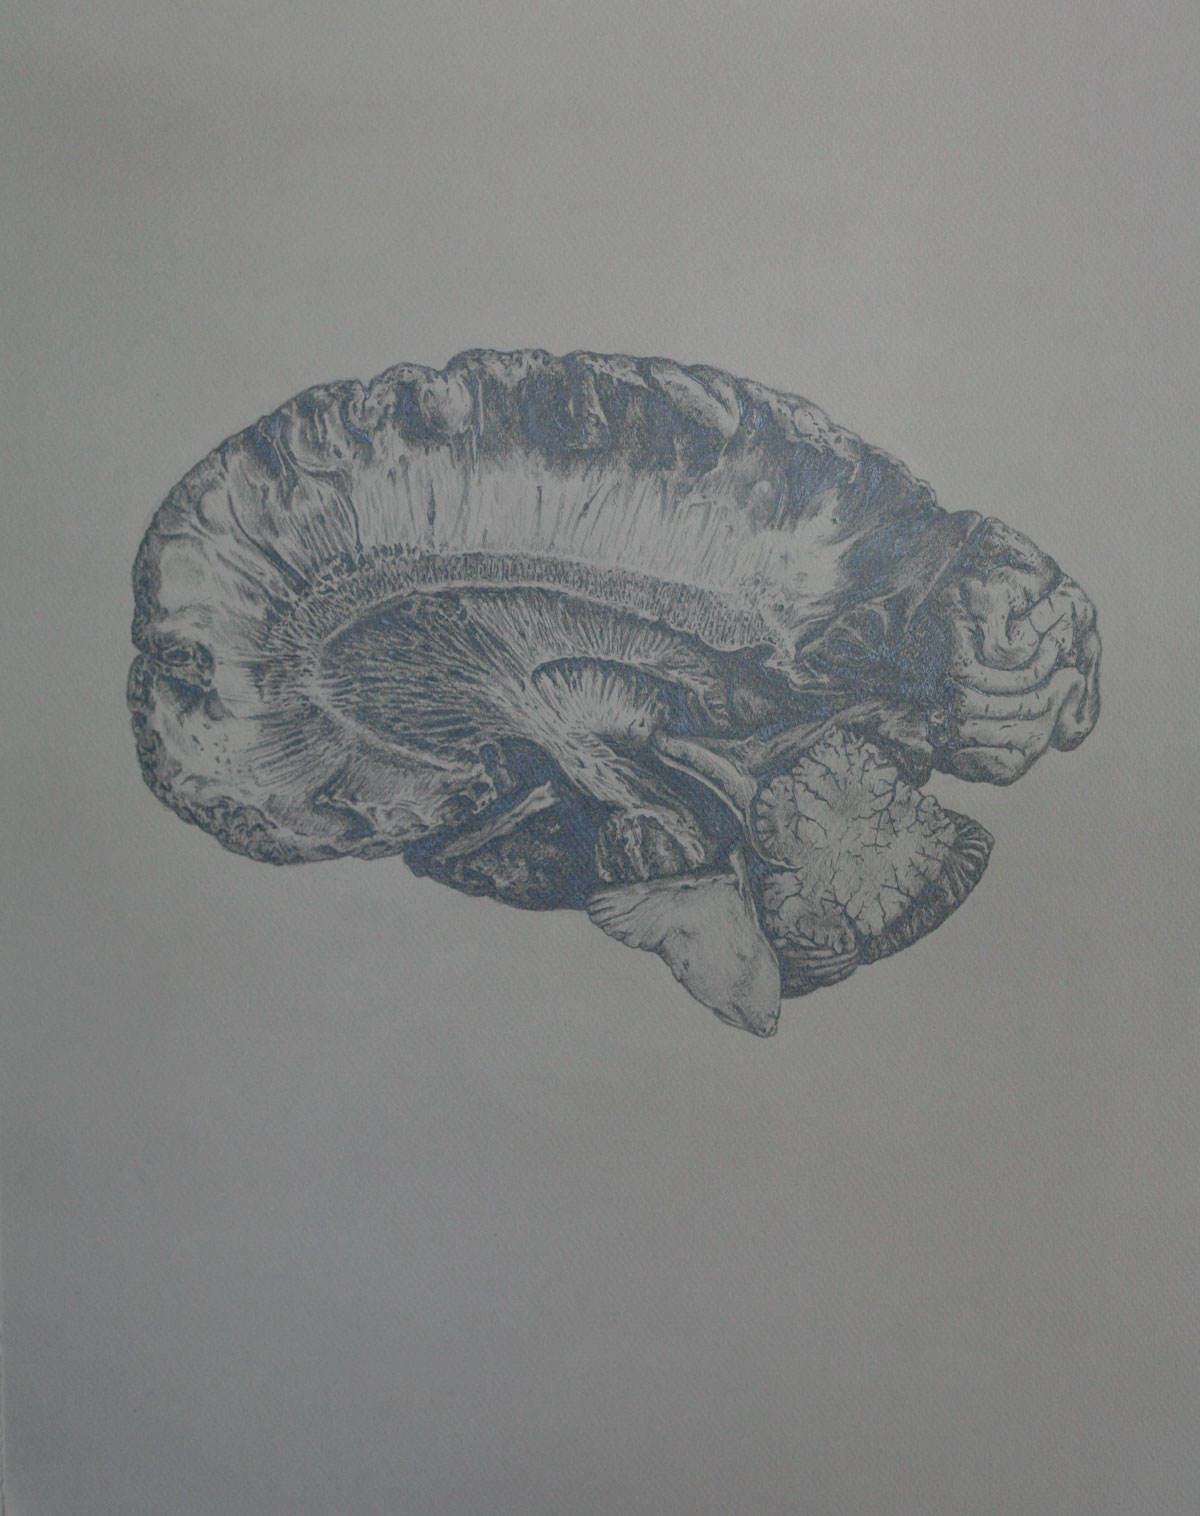 Mind and Specimen (Study no. 3)